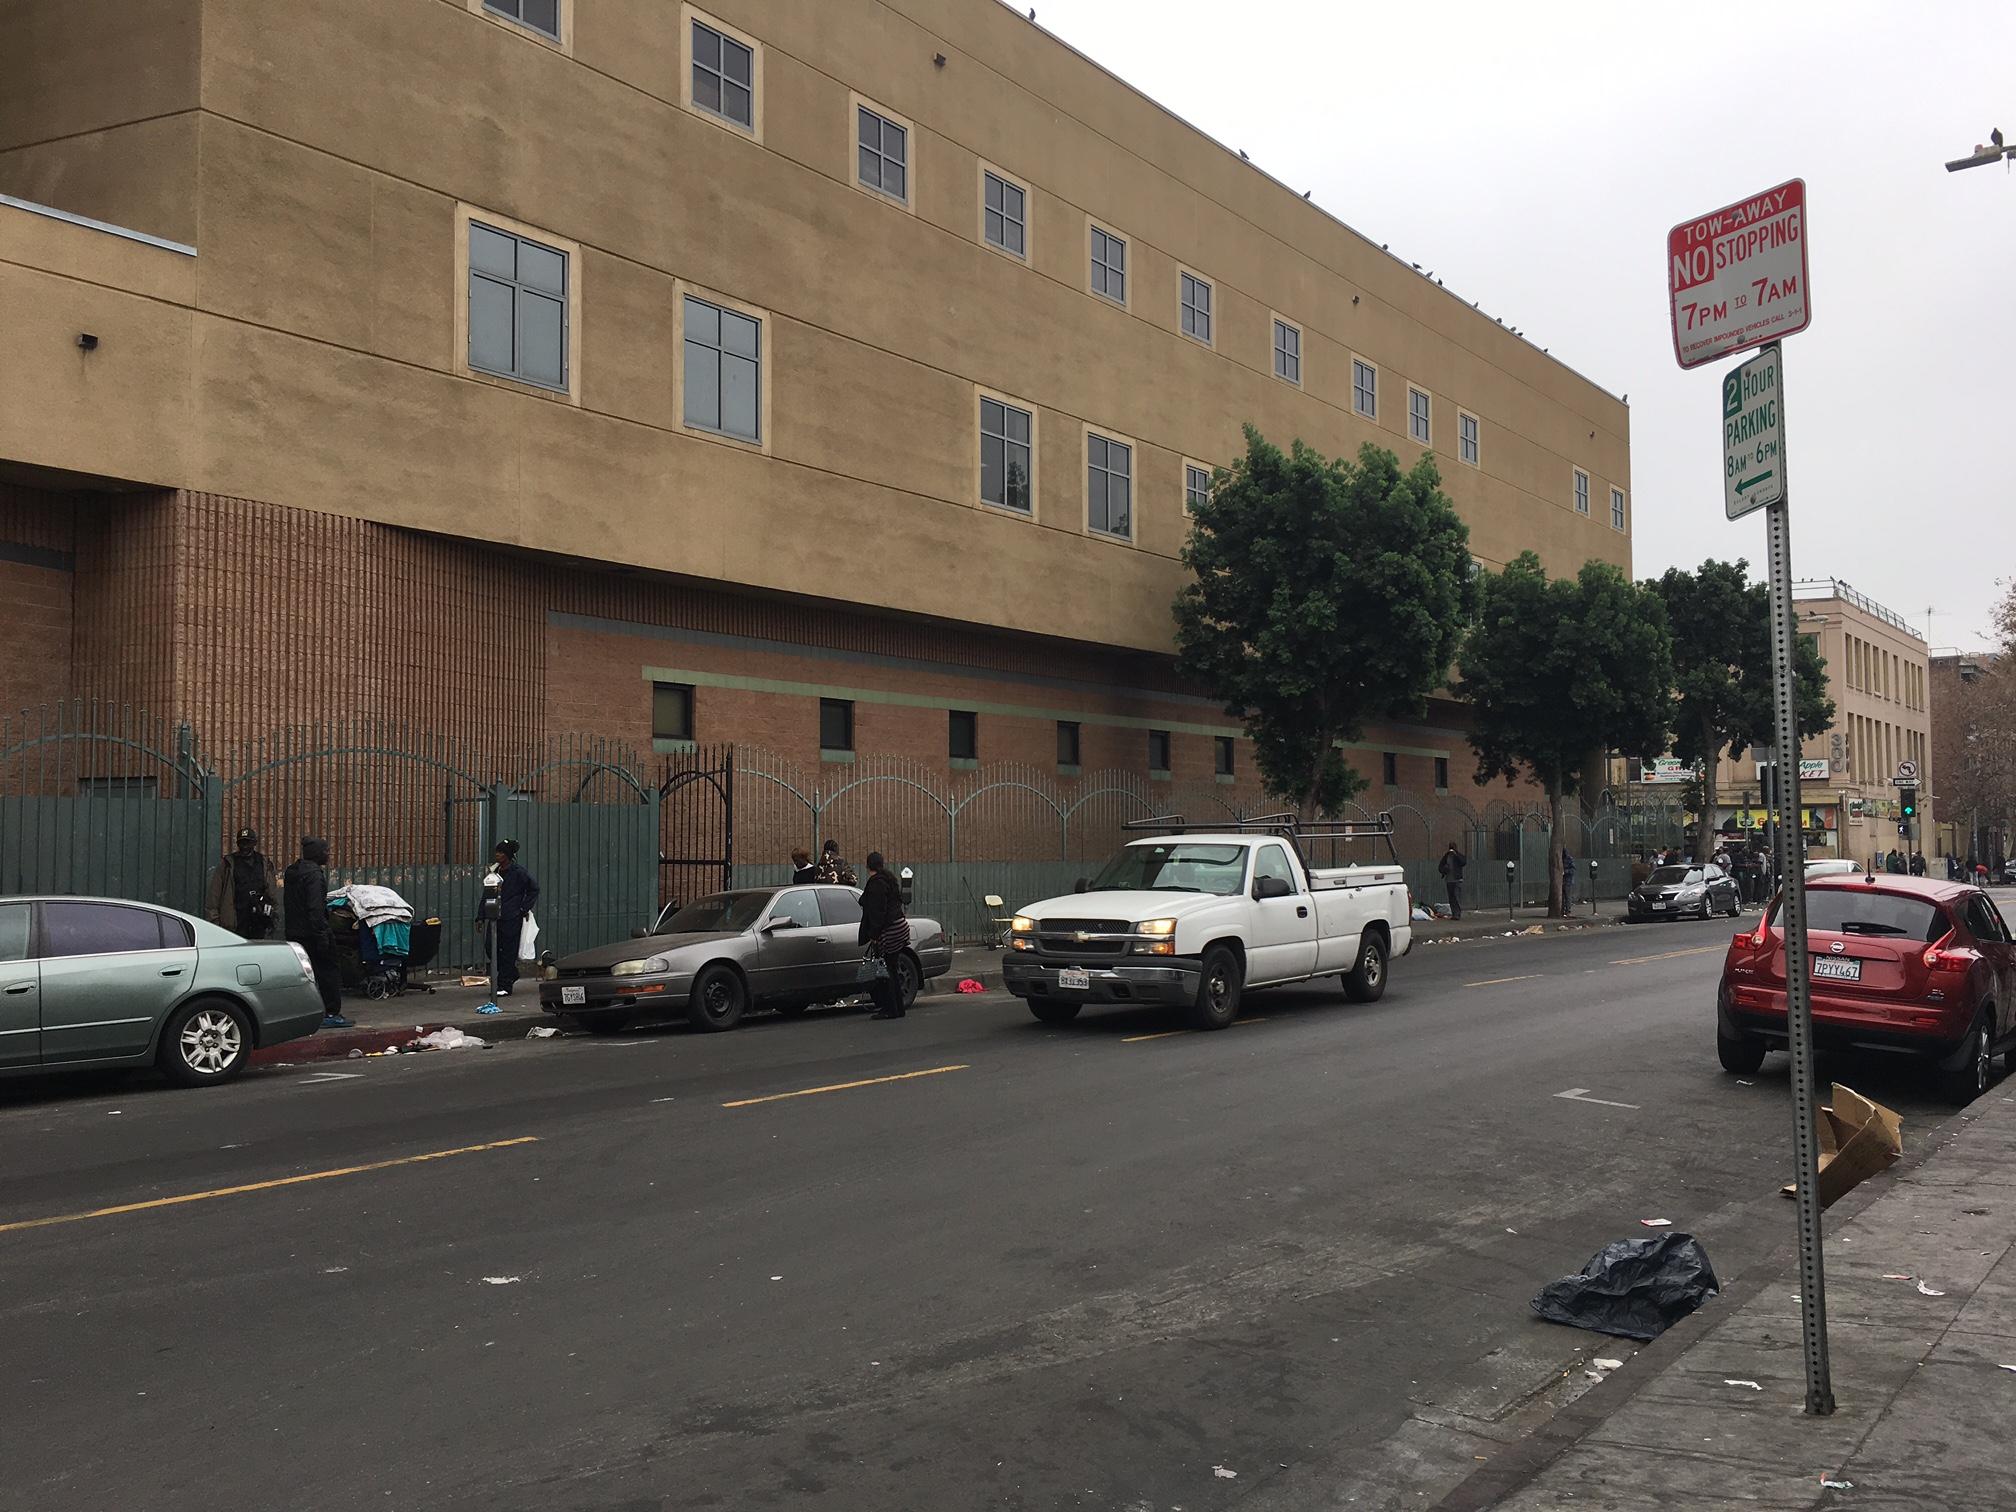 No place like California to be homeless